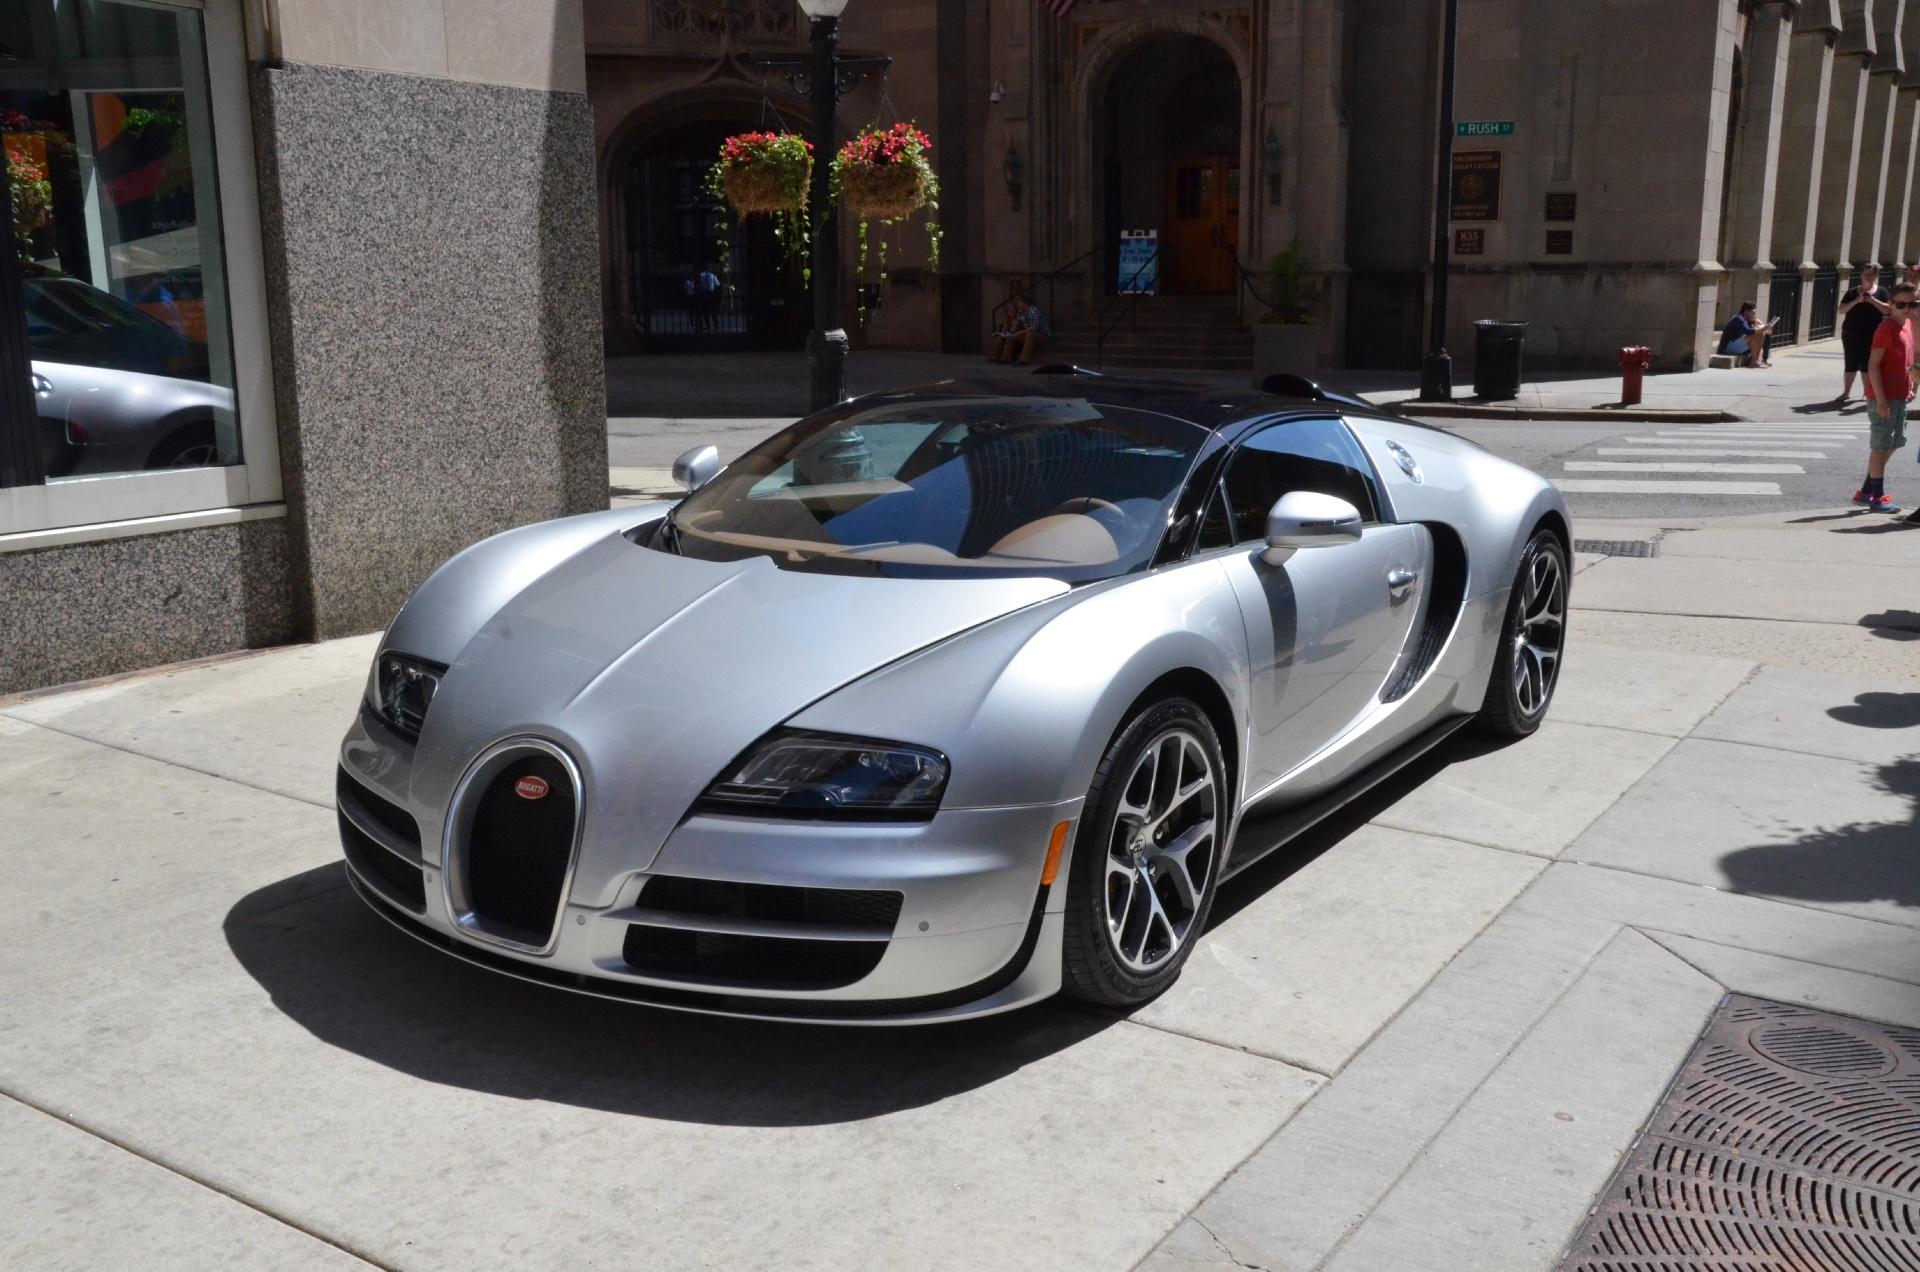 2014 bugatti veyron grand sport vitesse stock bugatti. Black Bedroom Furniture Sets. Home Design Ideas